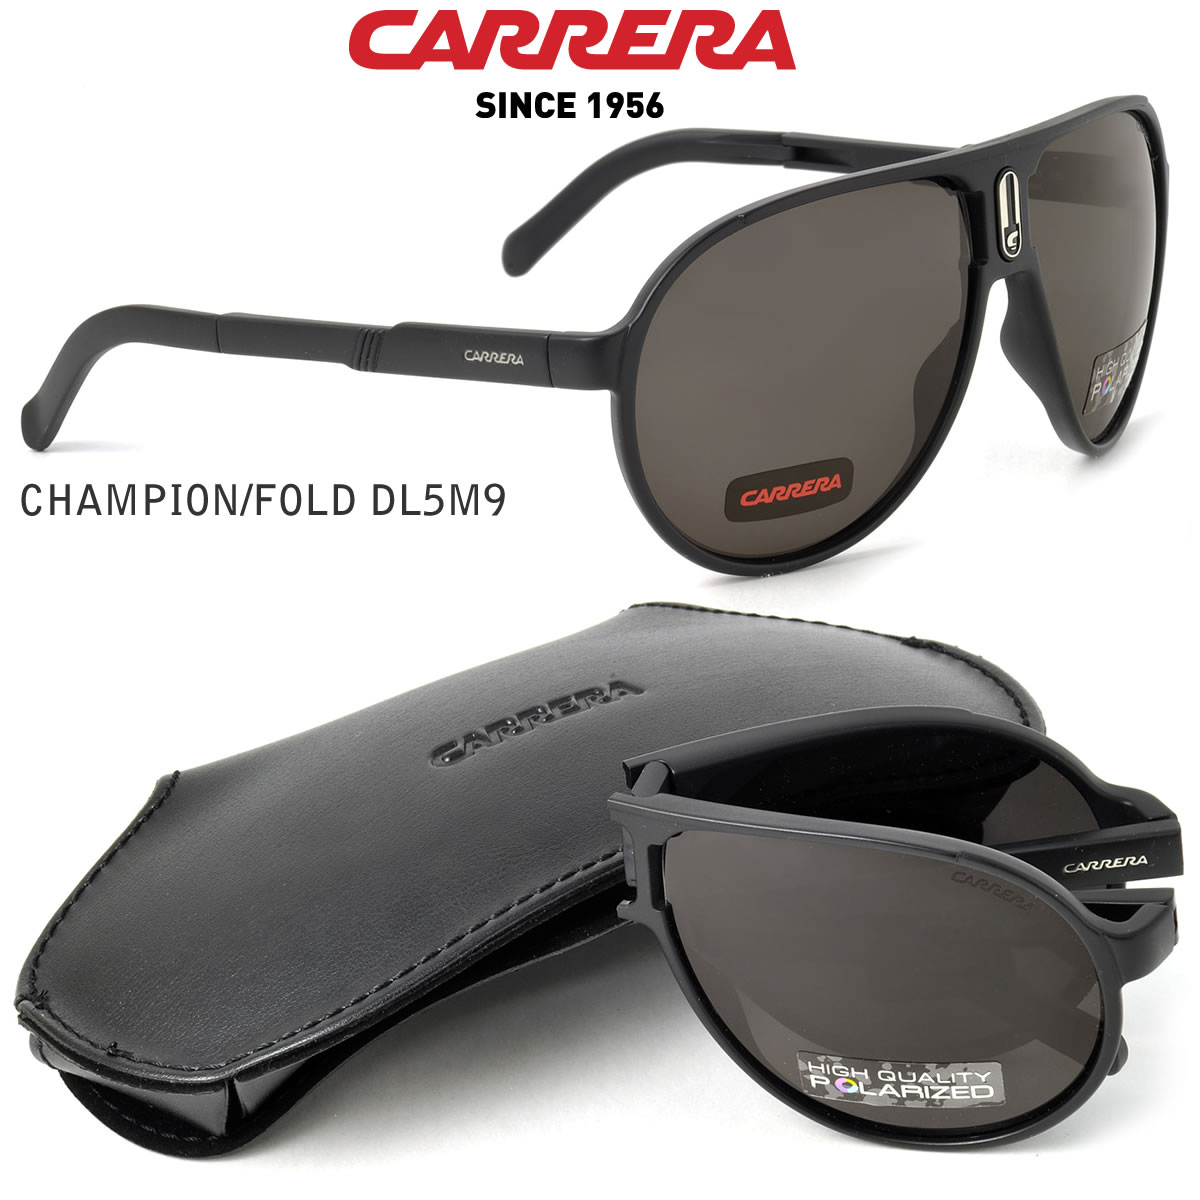 6c3c727bc9 ... carrera champion fold sunglasses